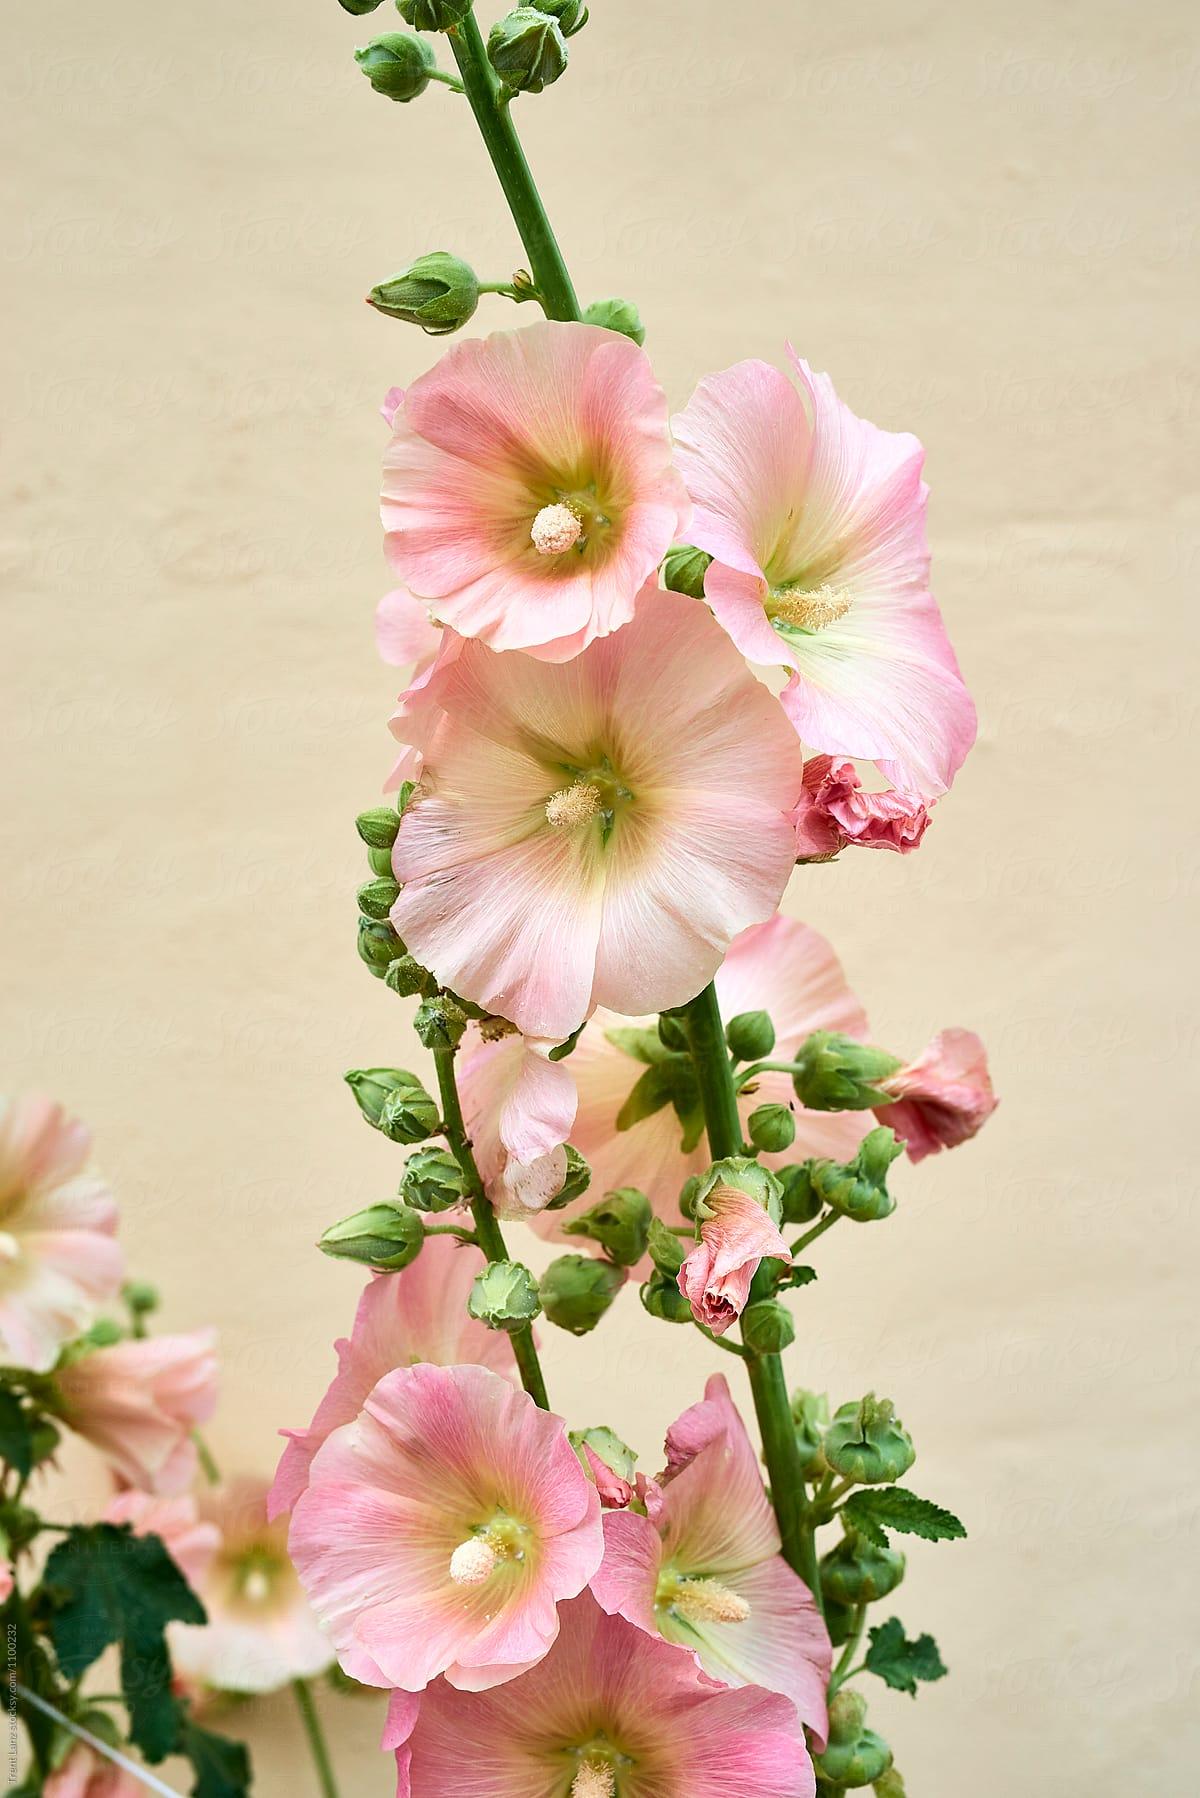 Light Pink Flowers Outdoor Stocksy United